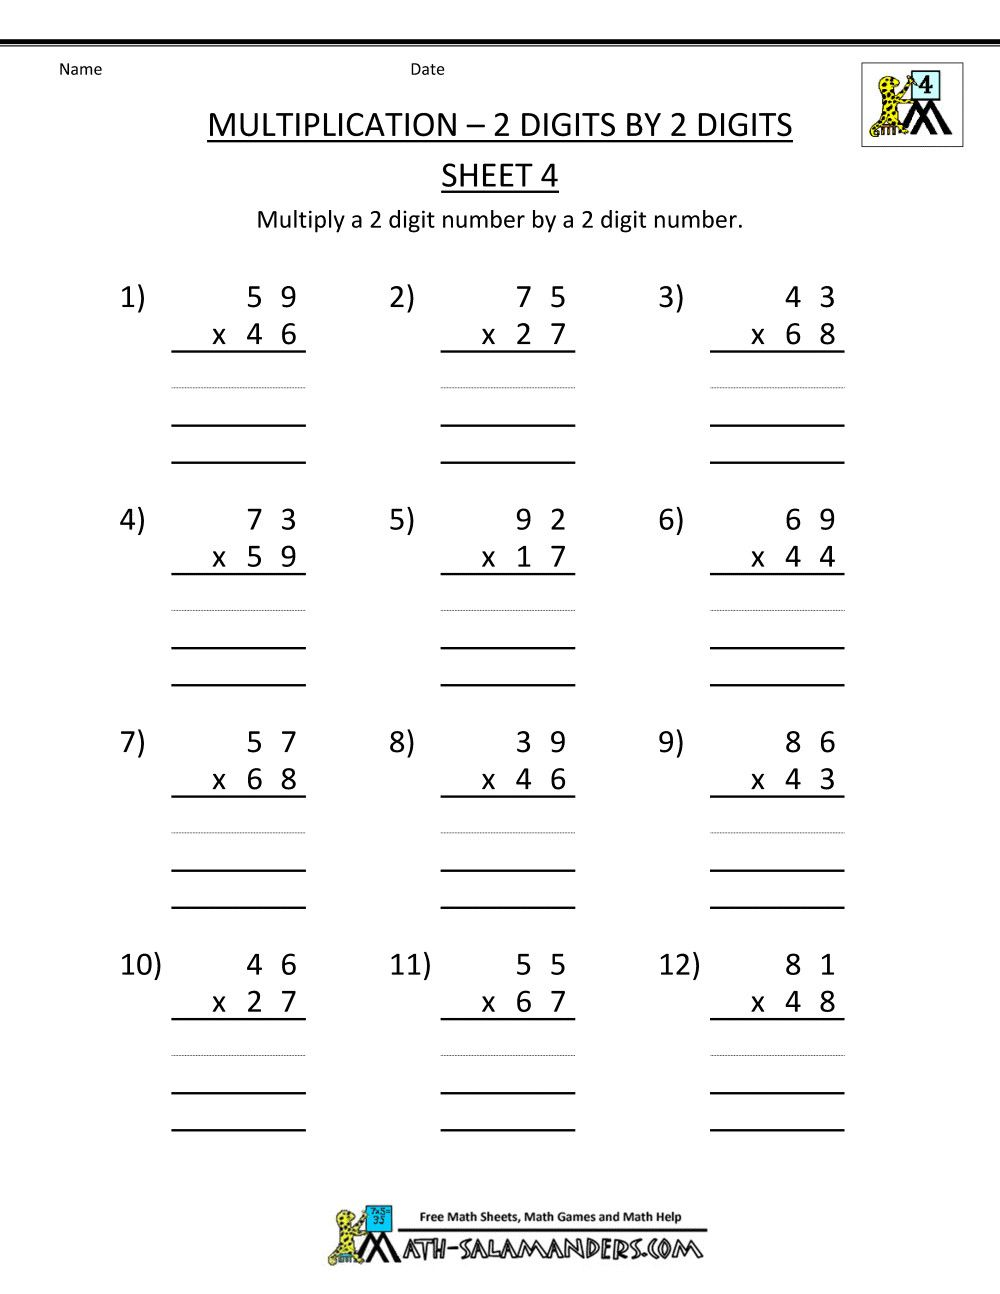 6 4 Digit Addition Worksheets Pdf In 2020 4th Grade Math Worksheets 4th Grade Multiplication Worksheets Printable Math Worksheets